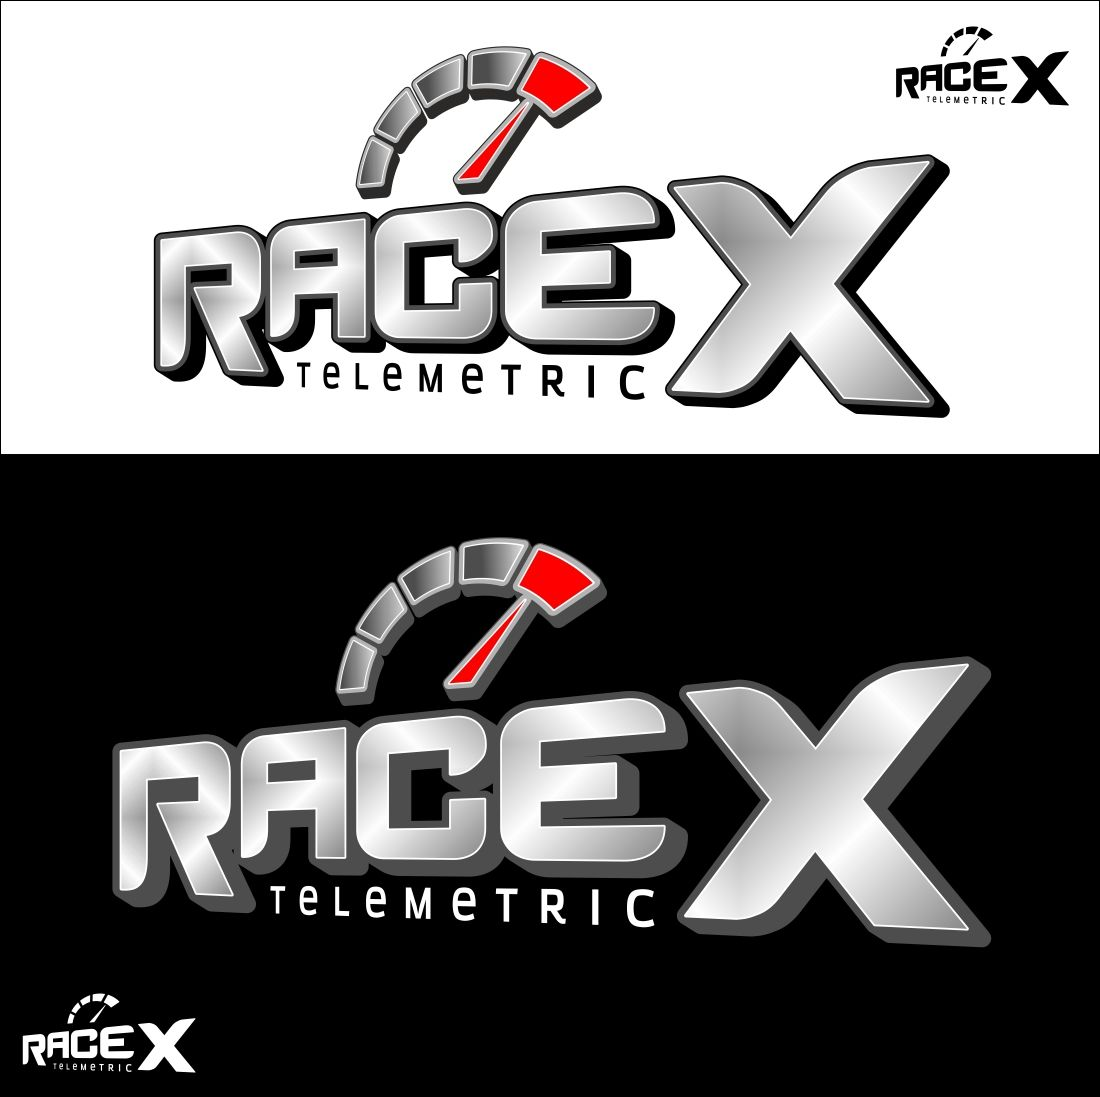 Логотип RaceX Telemetrics  - дизайнер hsochi